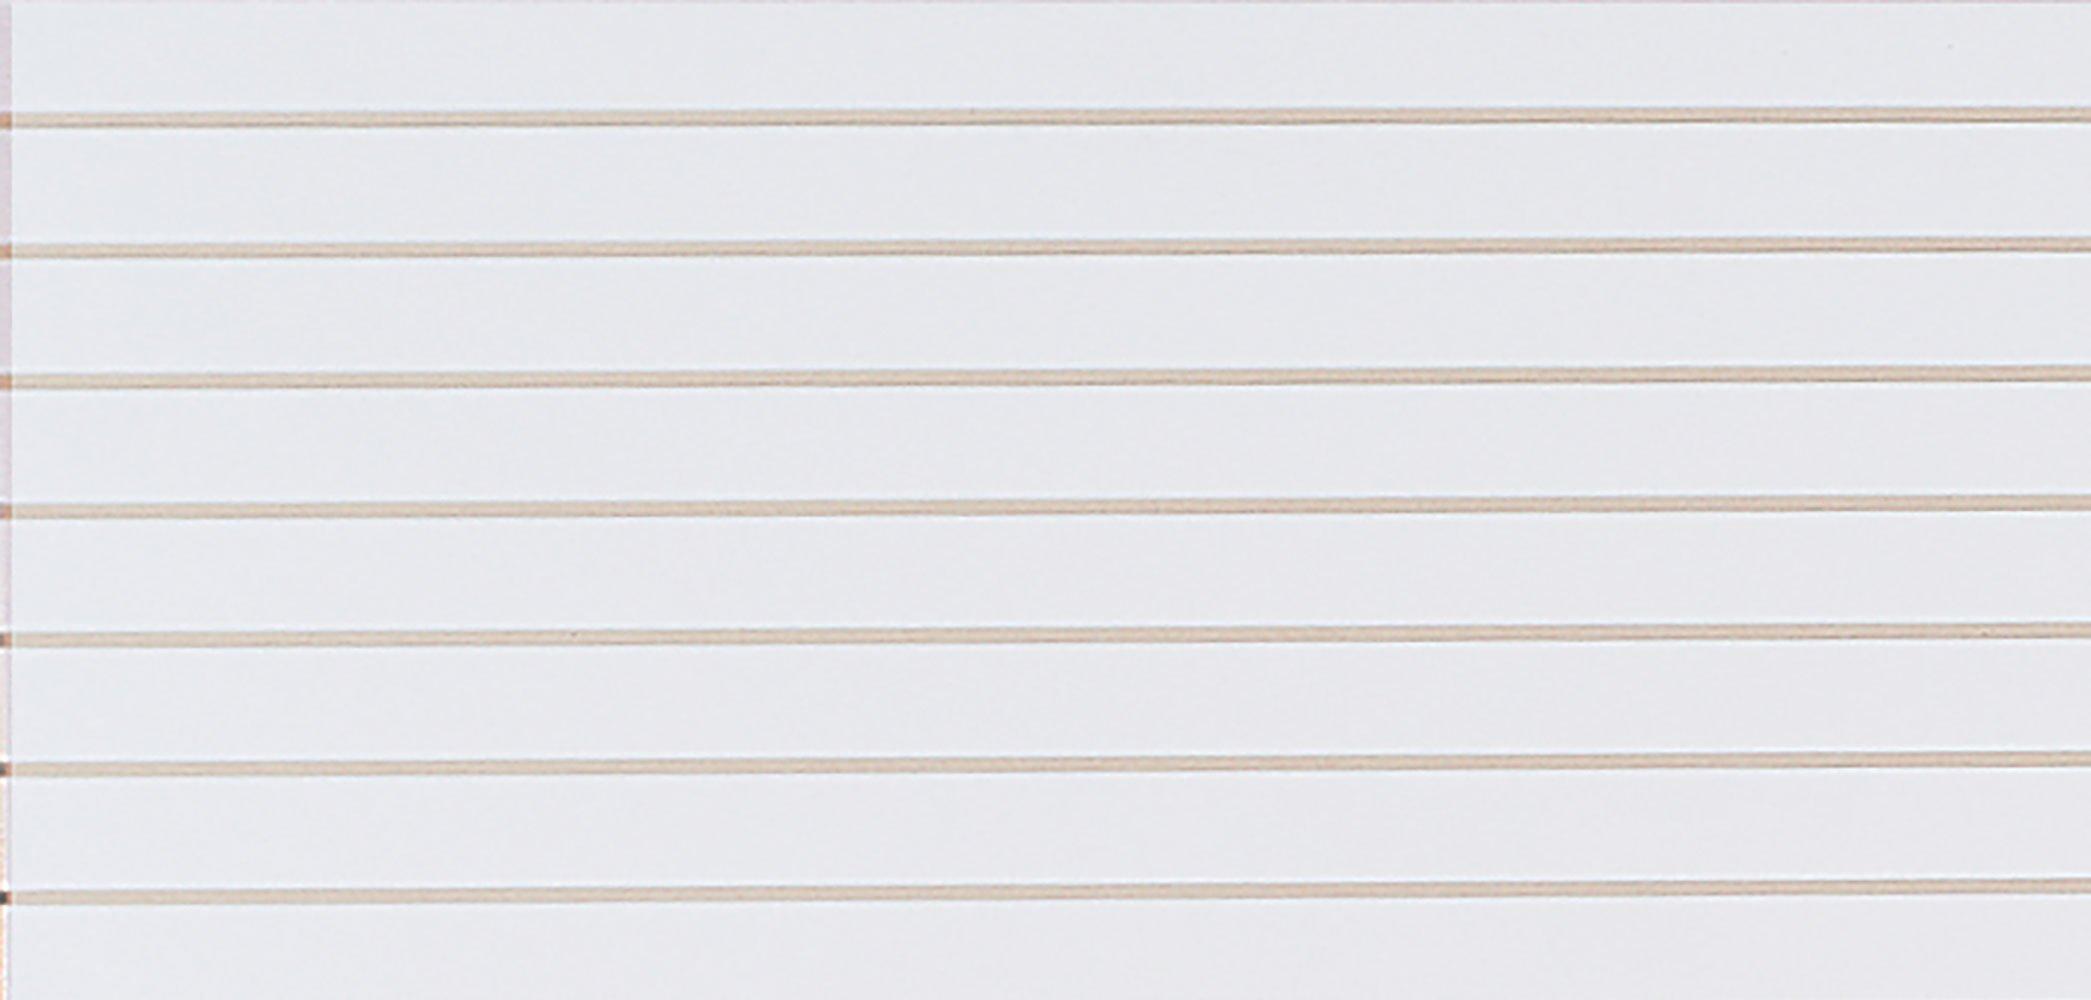 4 x 2 Foot Horizontal White Slatwall Easy Panels - Pack of 2